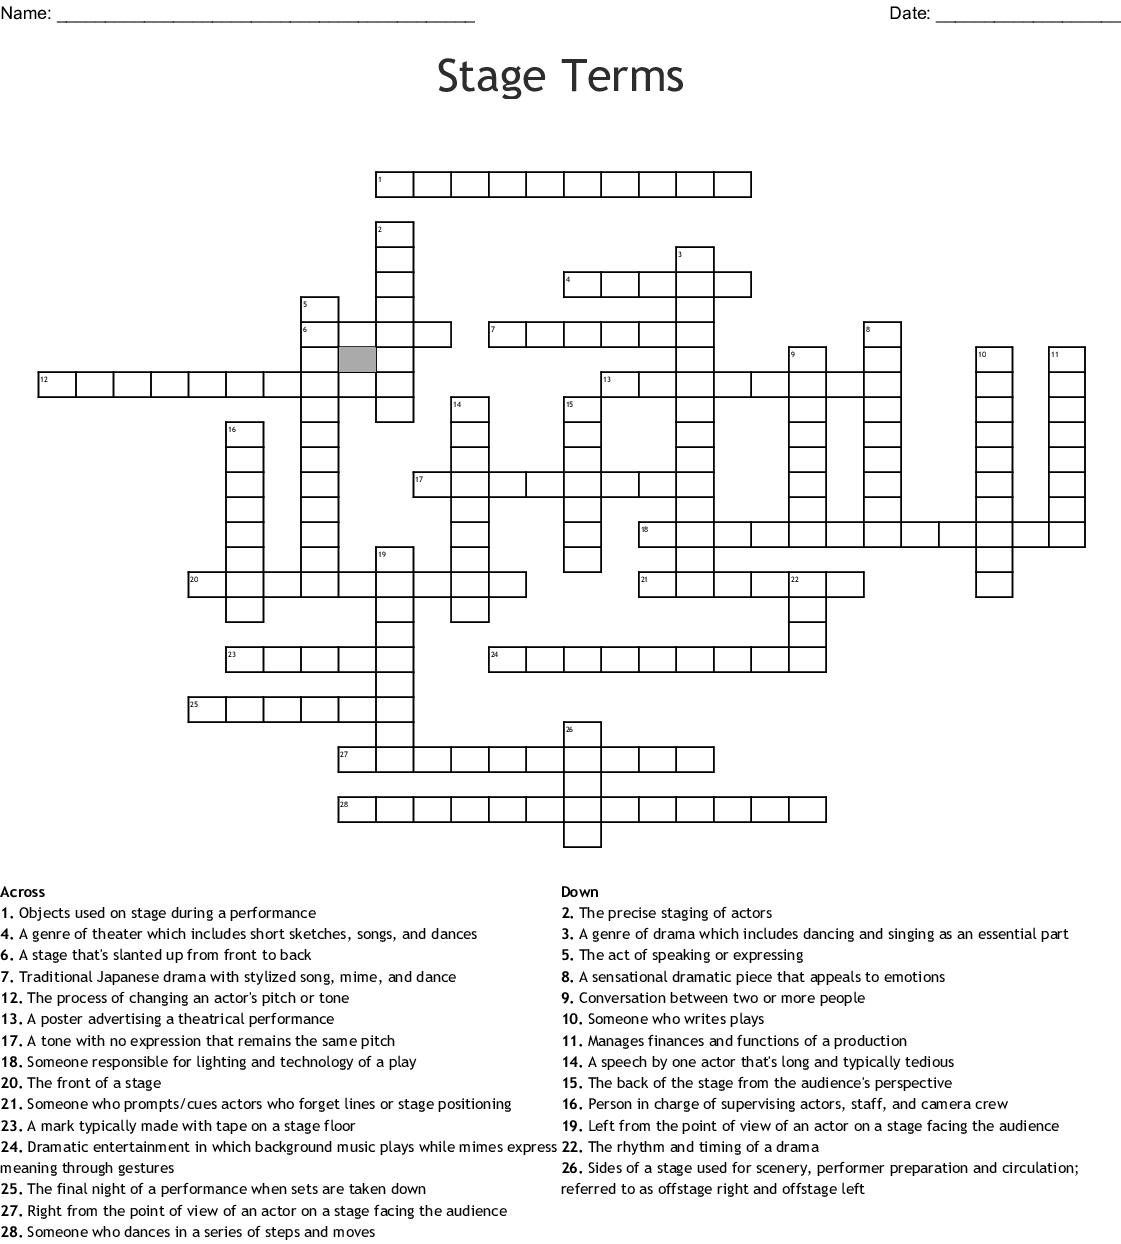 Stage Terms Crossword Wordmint